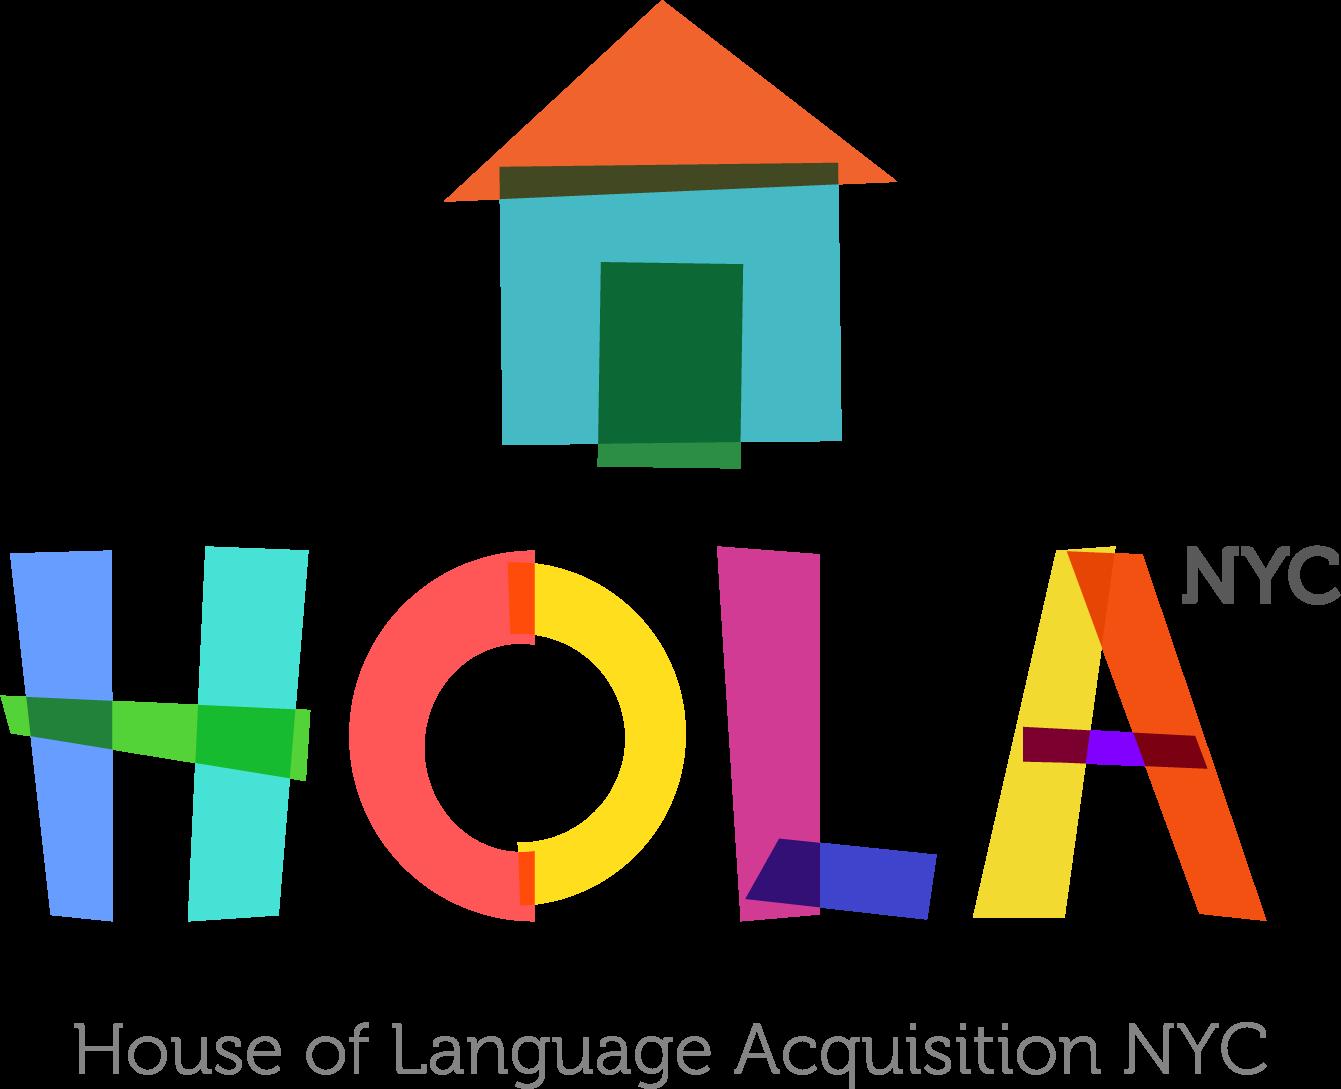 Logo of House of Language Acquisition